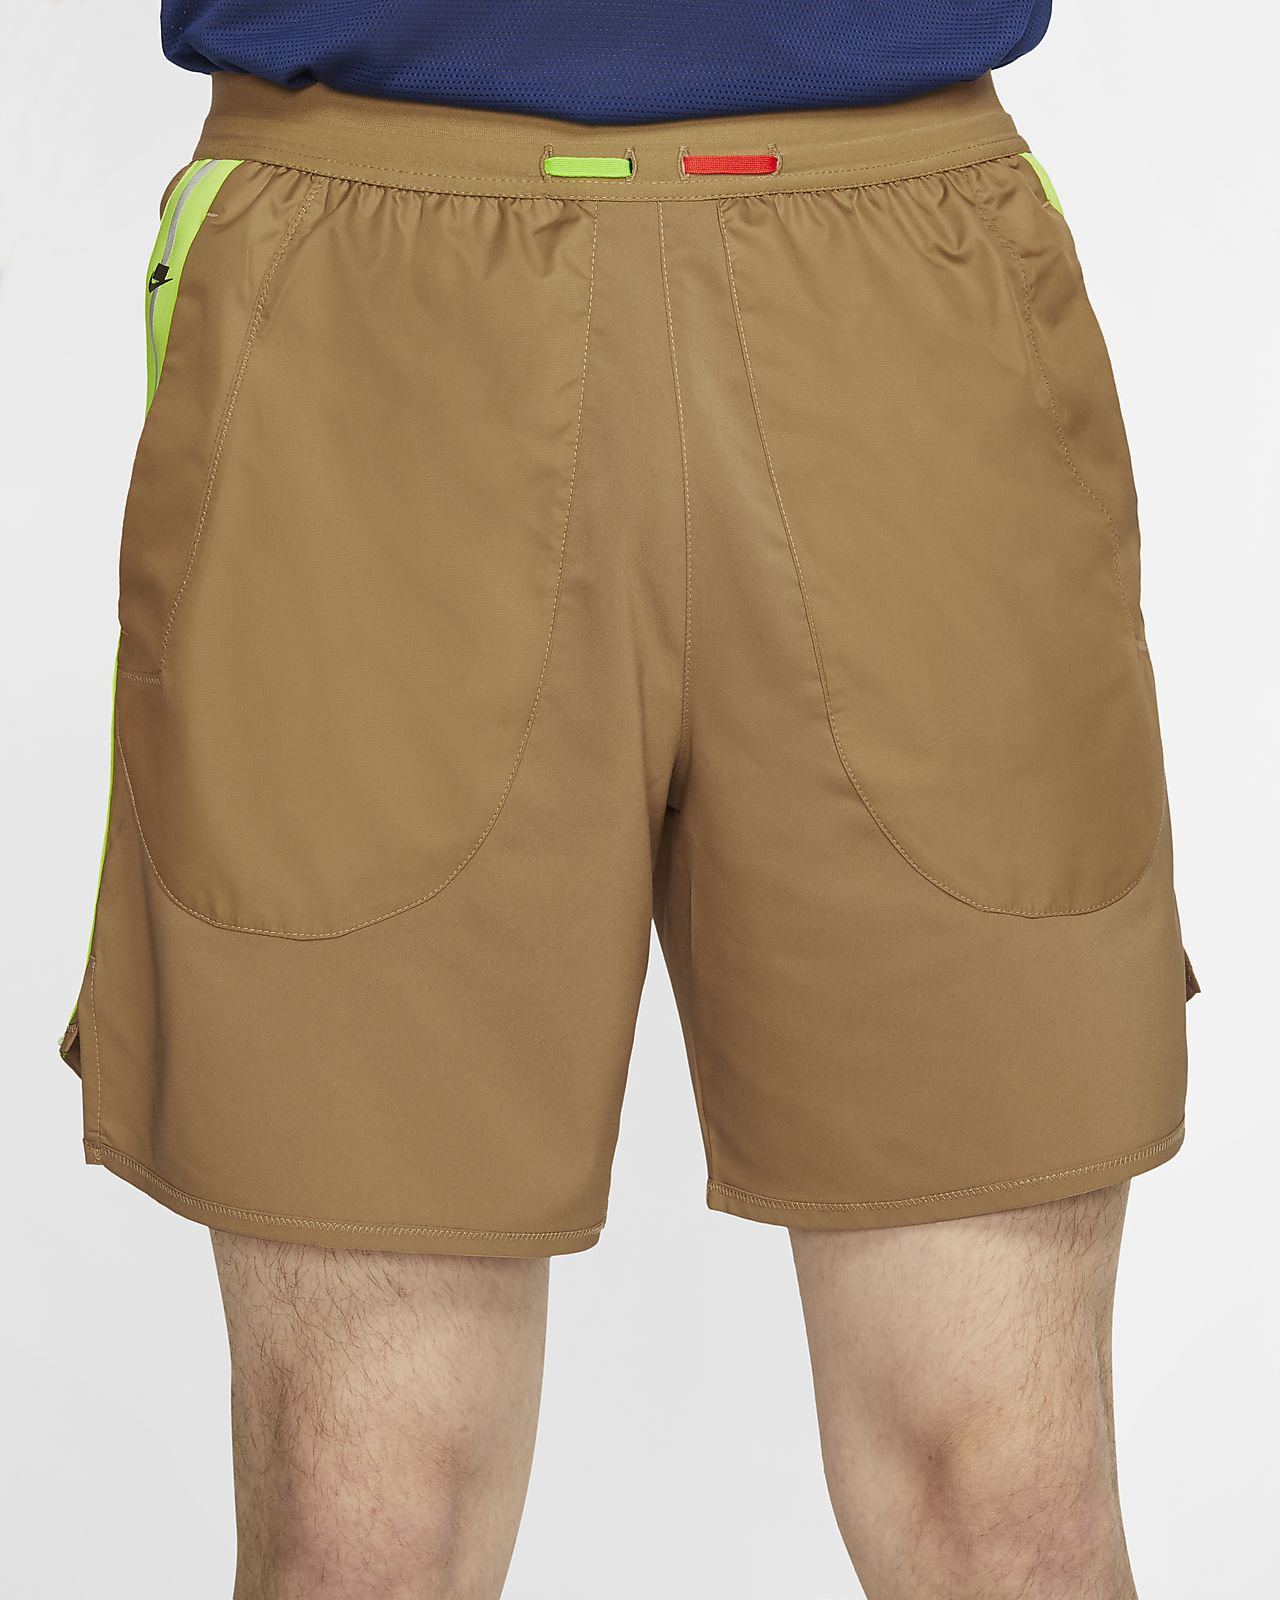 Short de running Nike 18 cm pour Homme